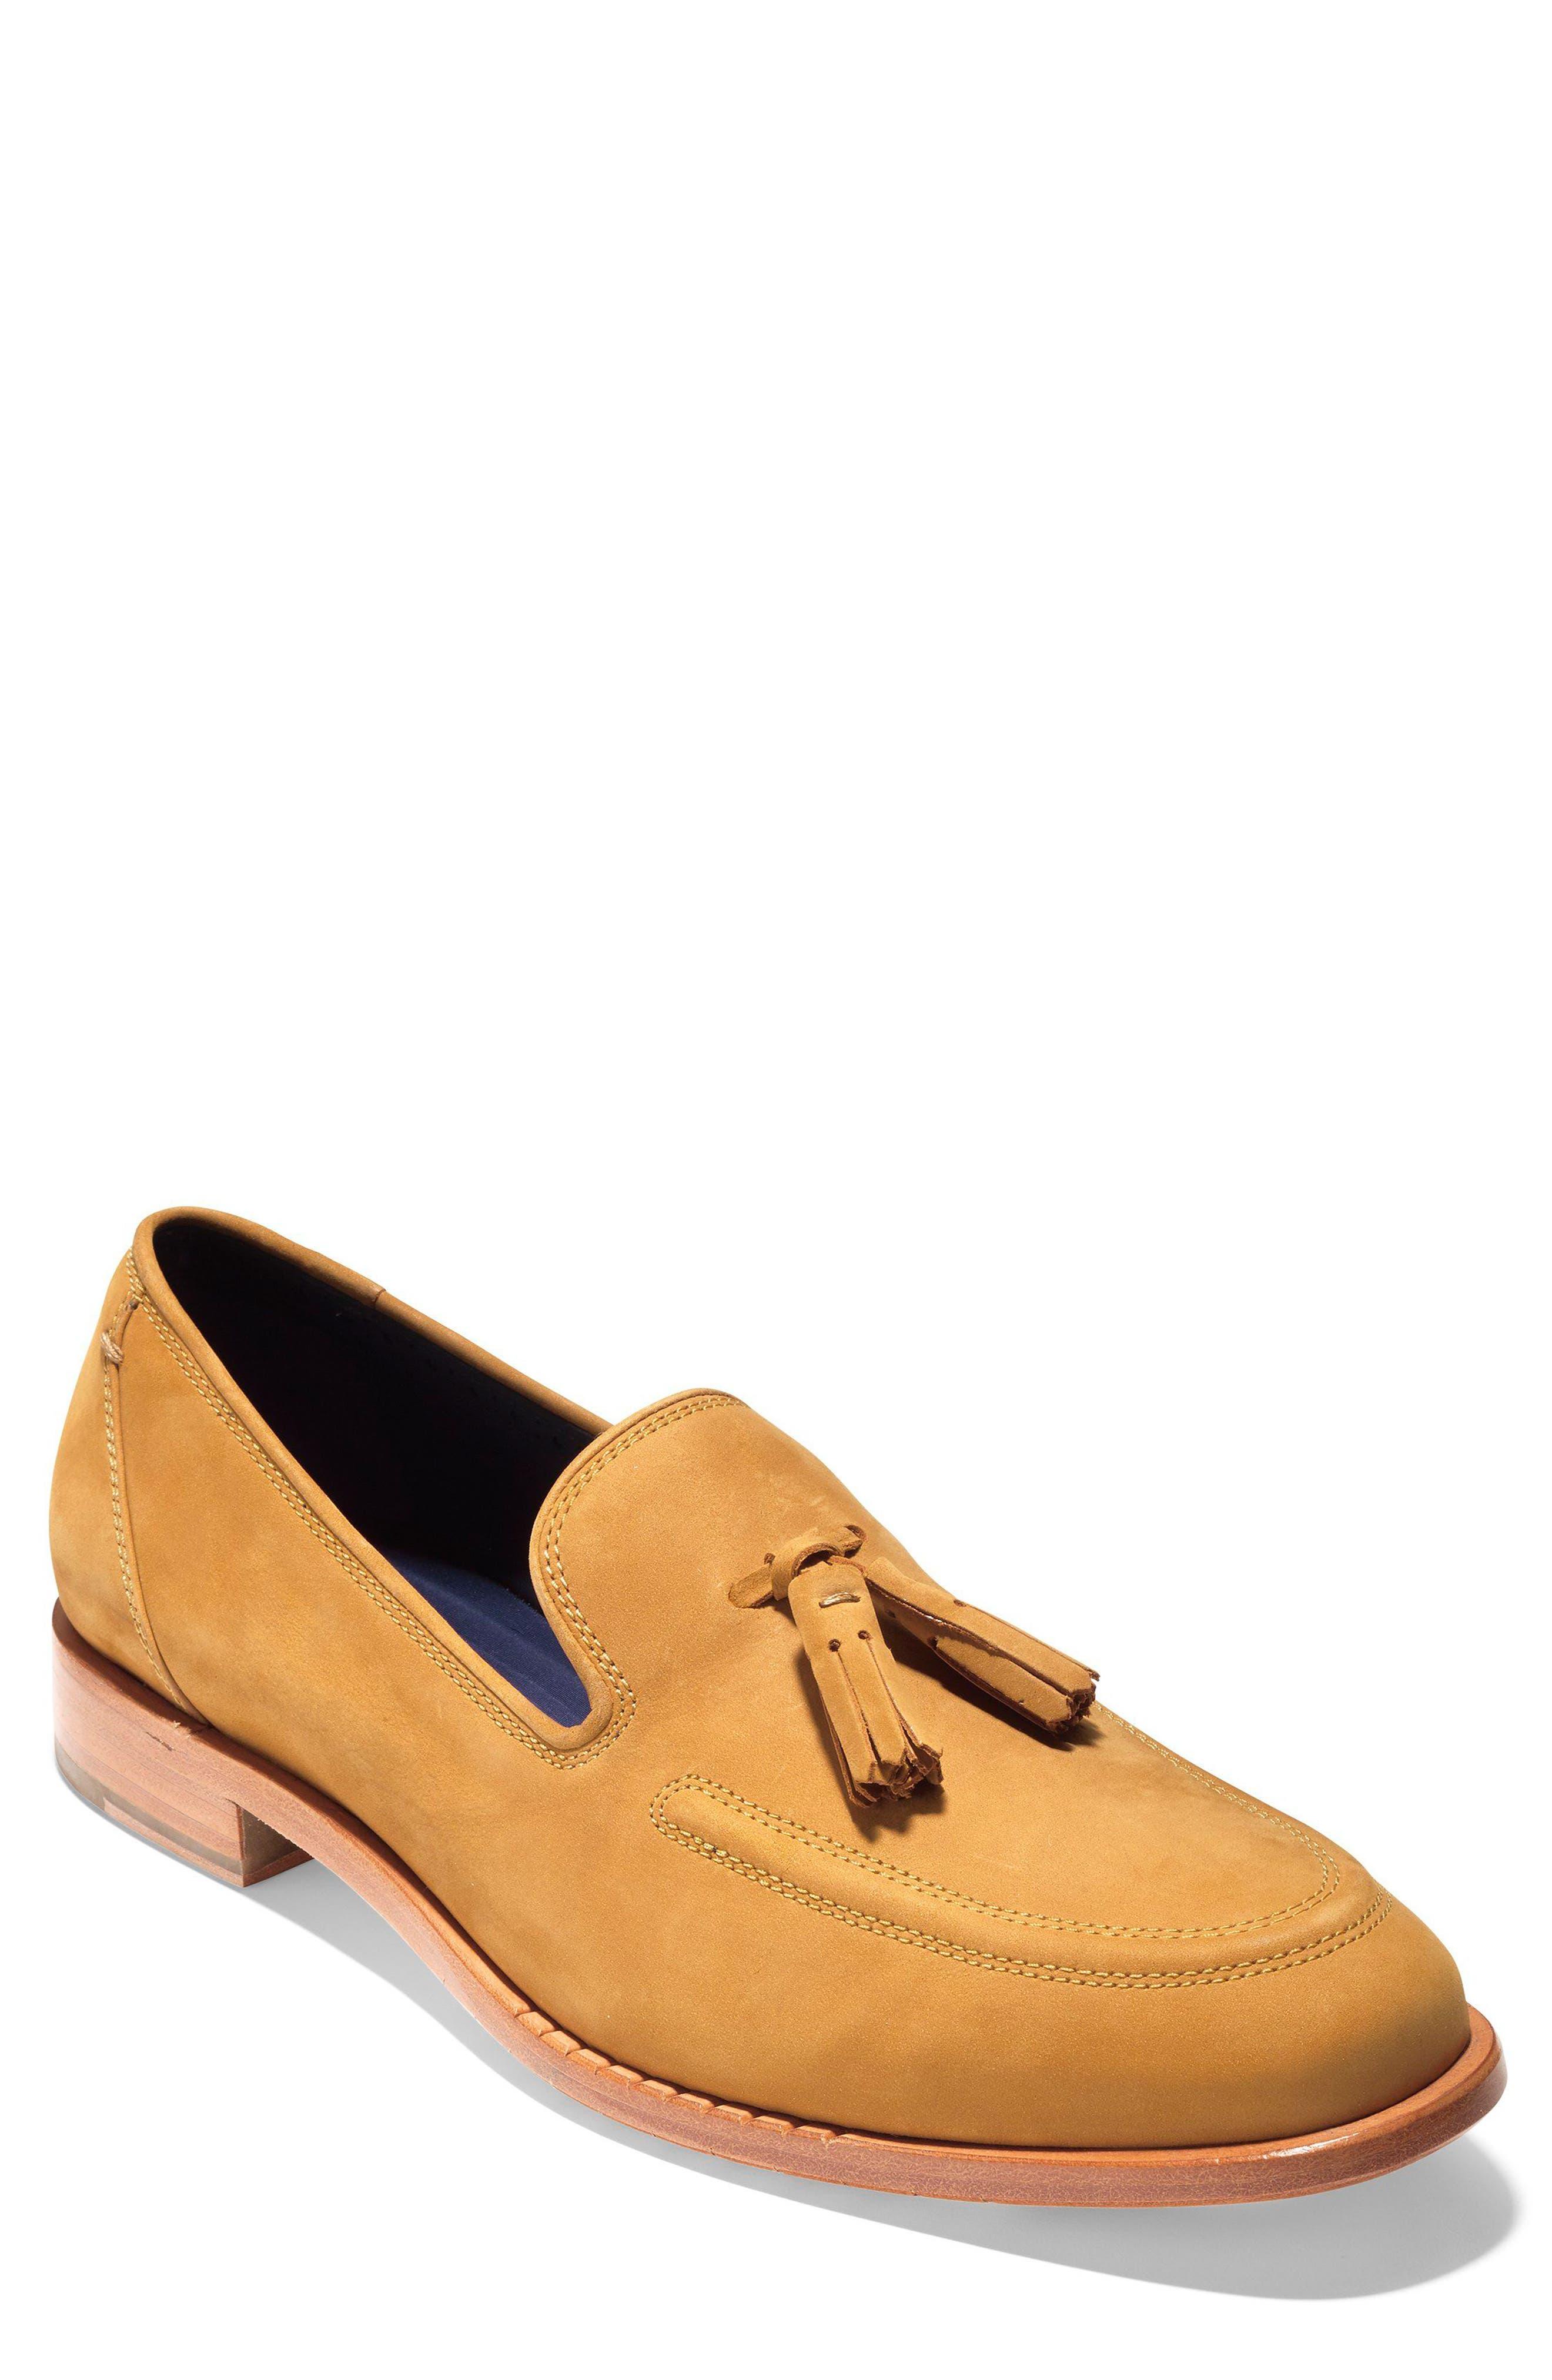 Washington Grand Tassel Loafer,                         Main,                         color, Cathay Spice Nubuck